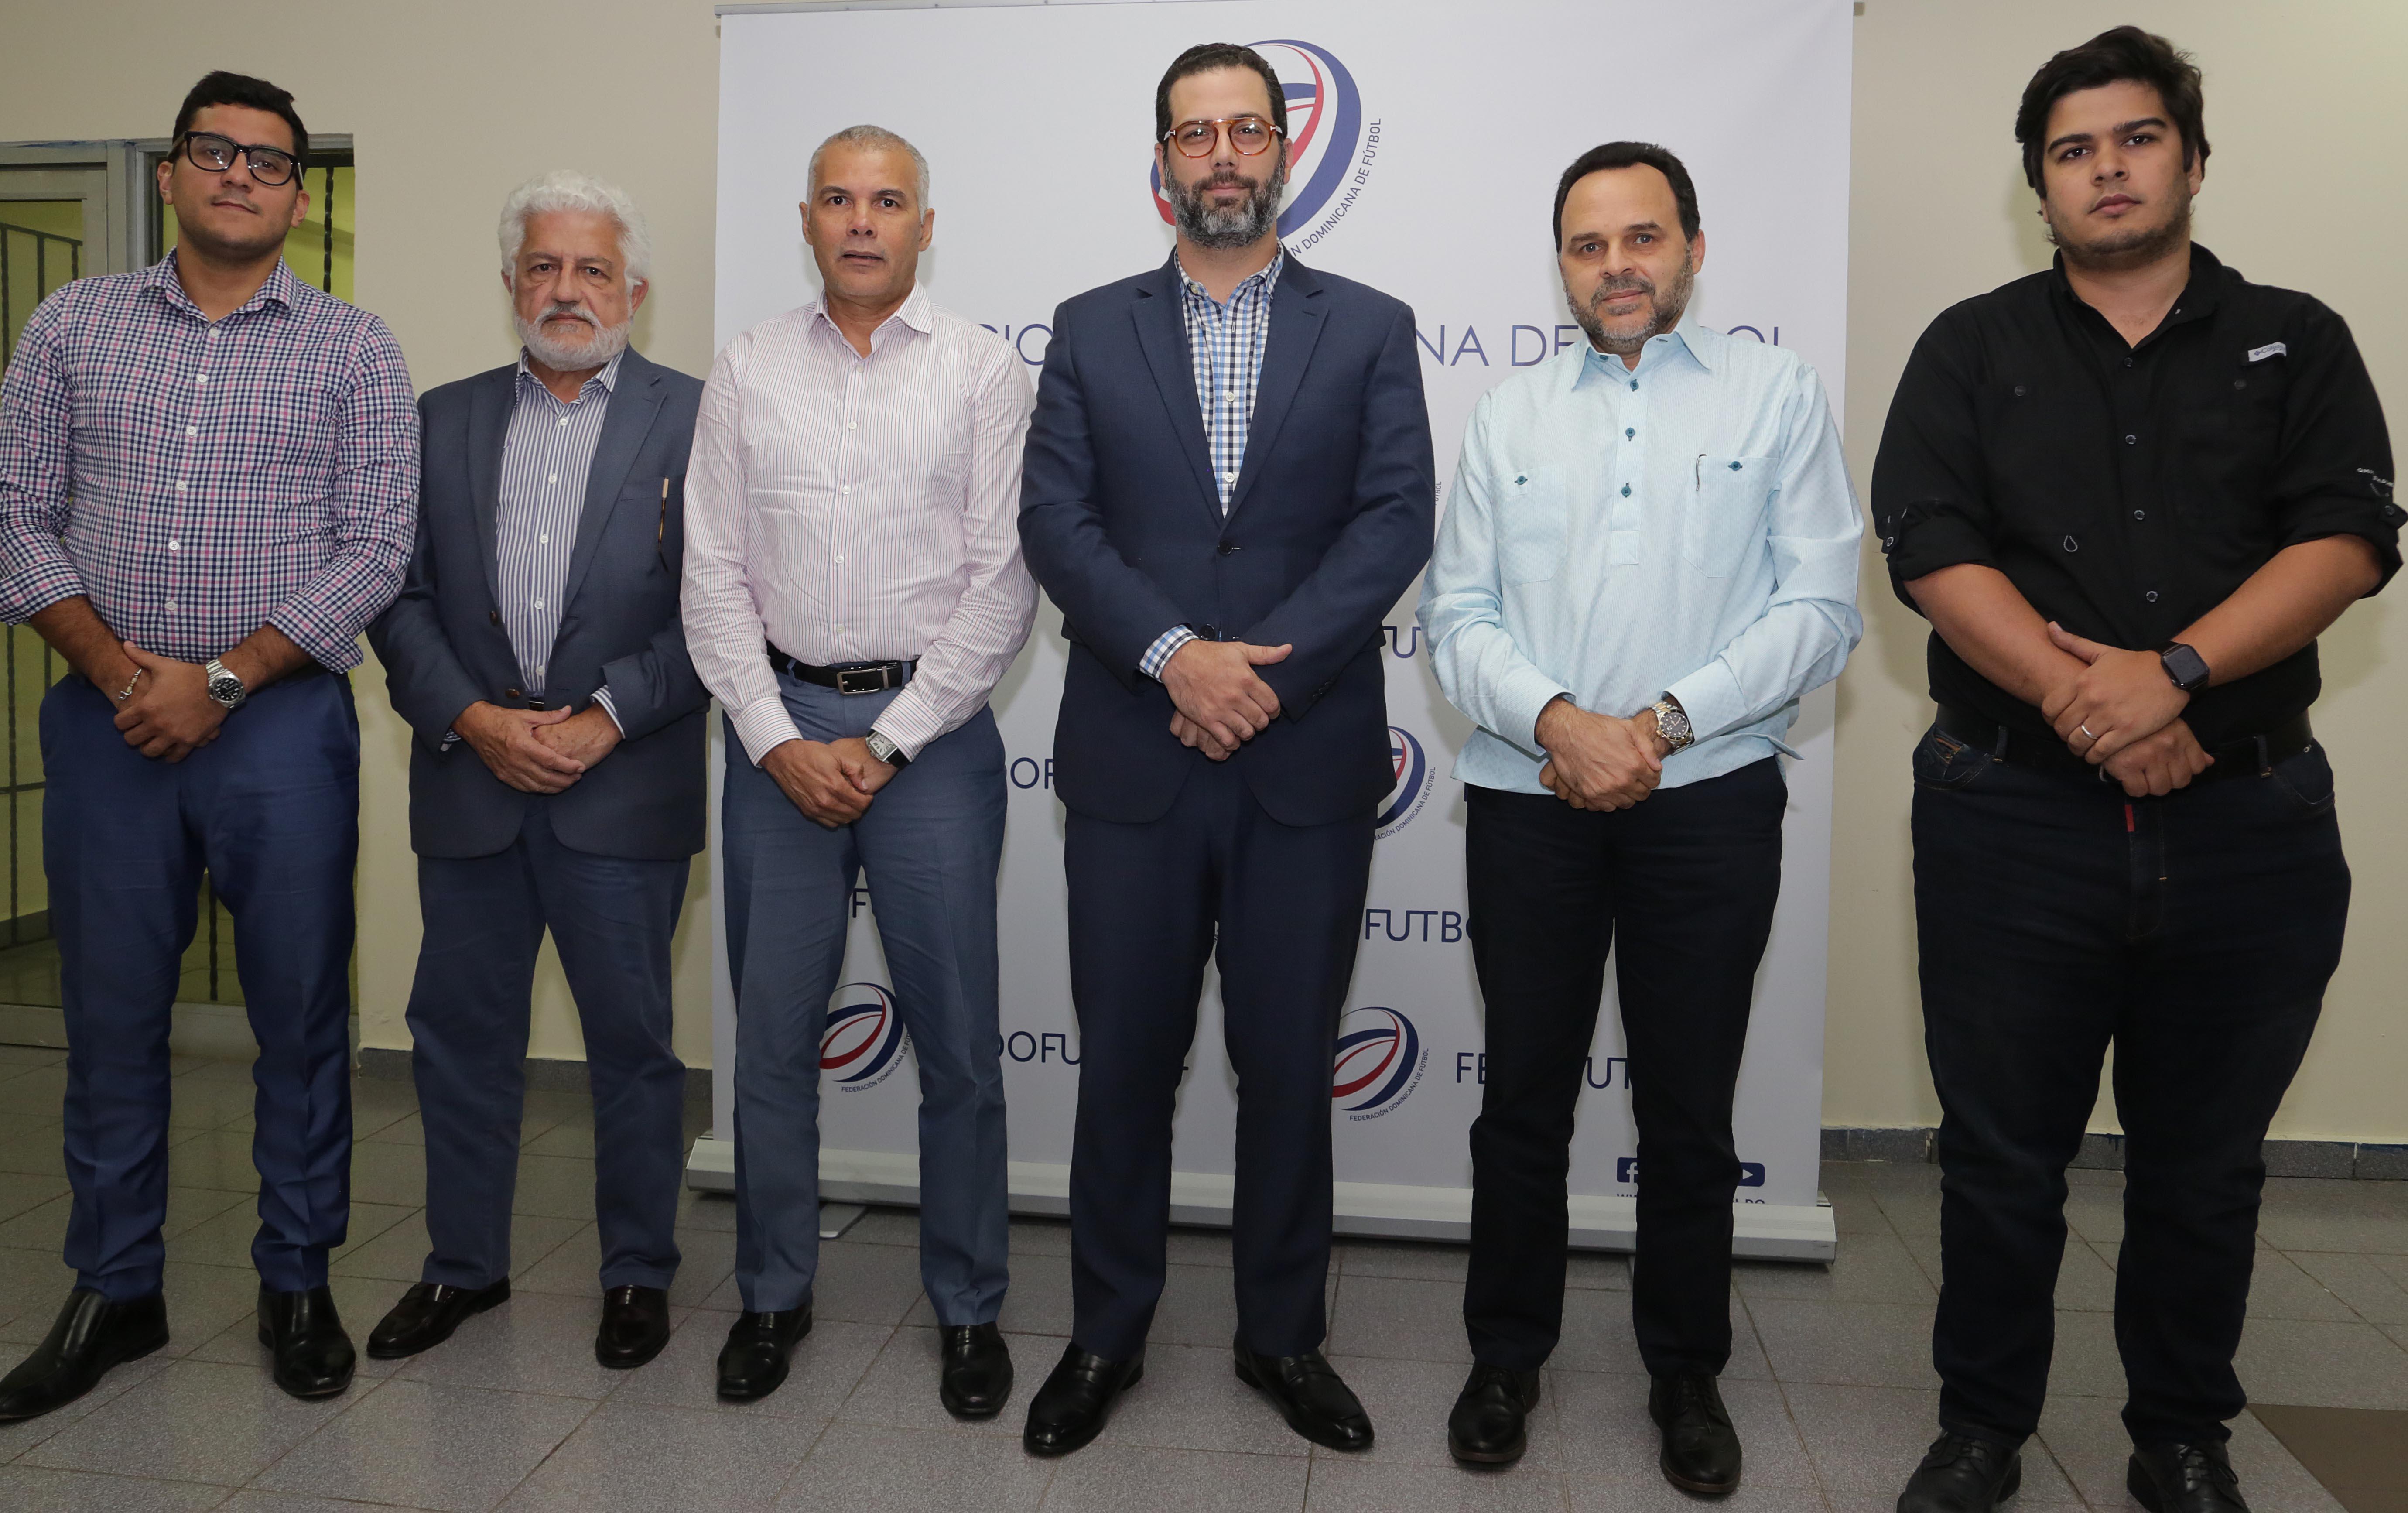 Precandidatos a presidencia de Fedofubol apoyan proceso de normalización